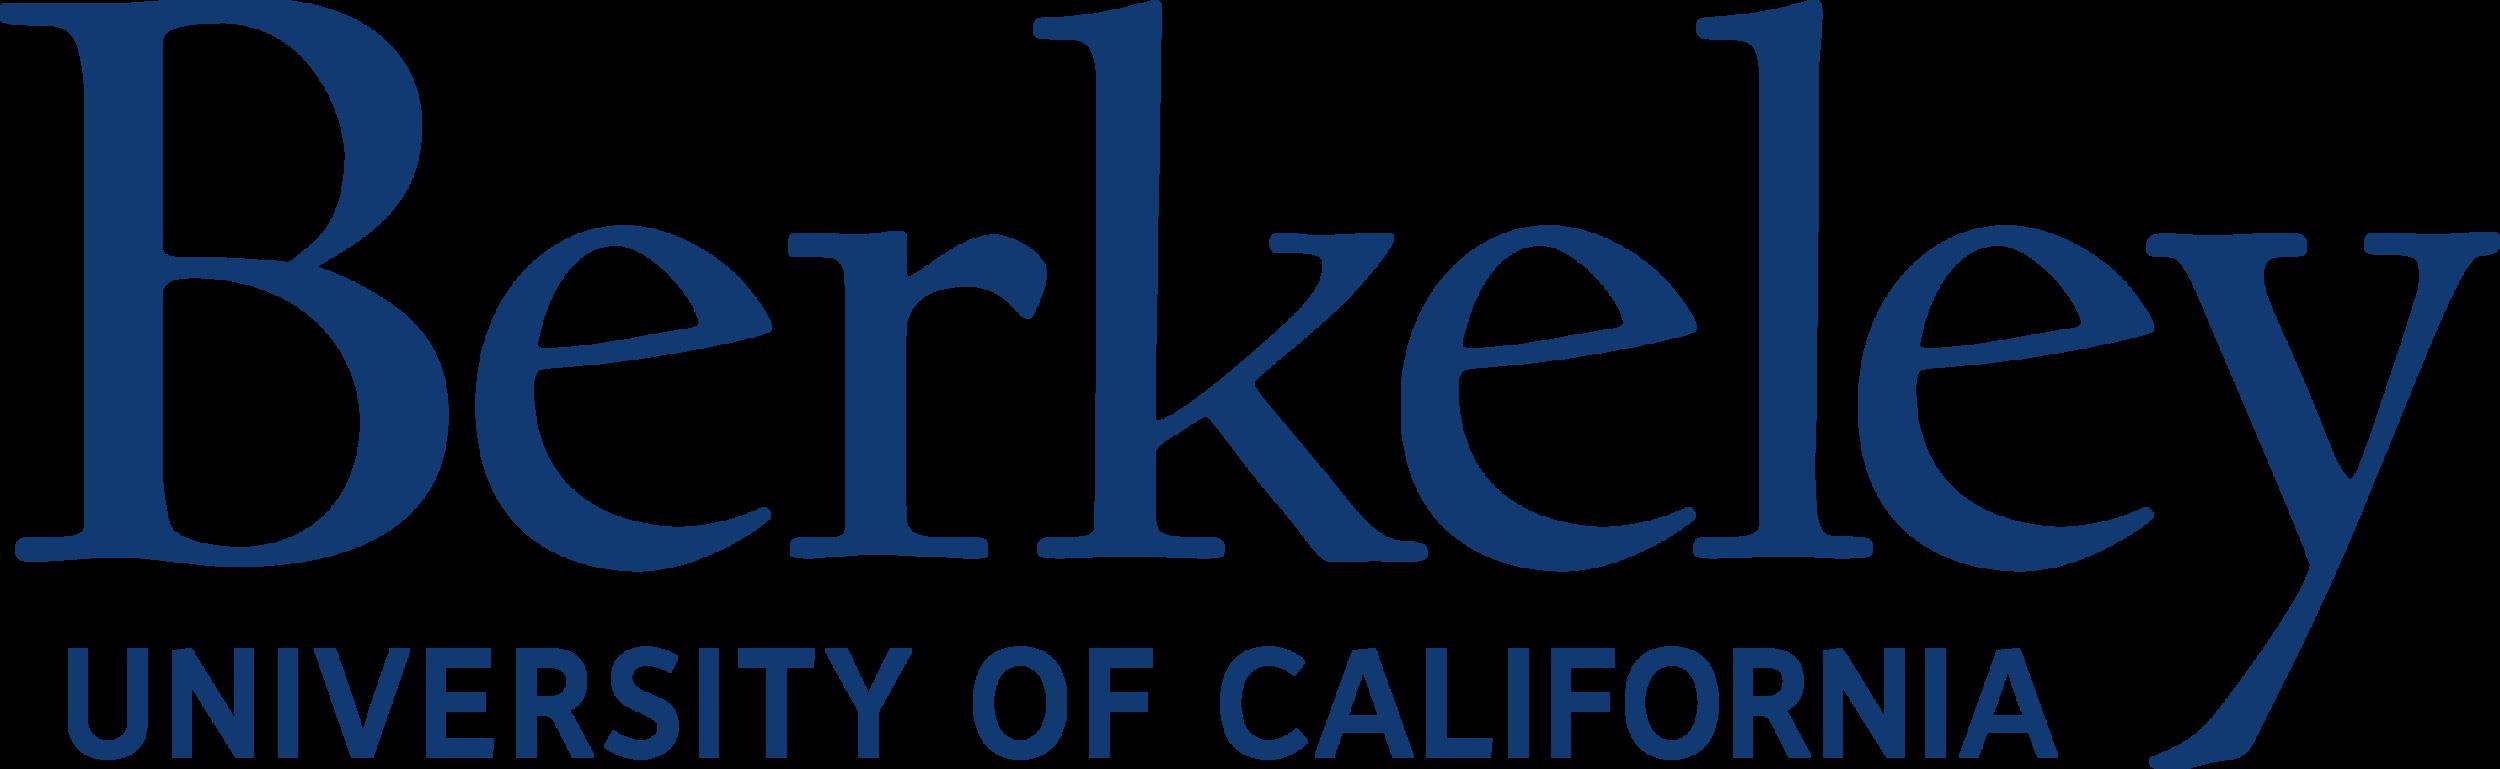 UC-Berkeley-Logo-University-of-California-Berkeley.png